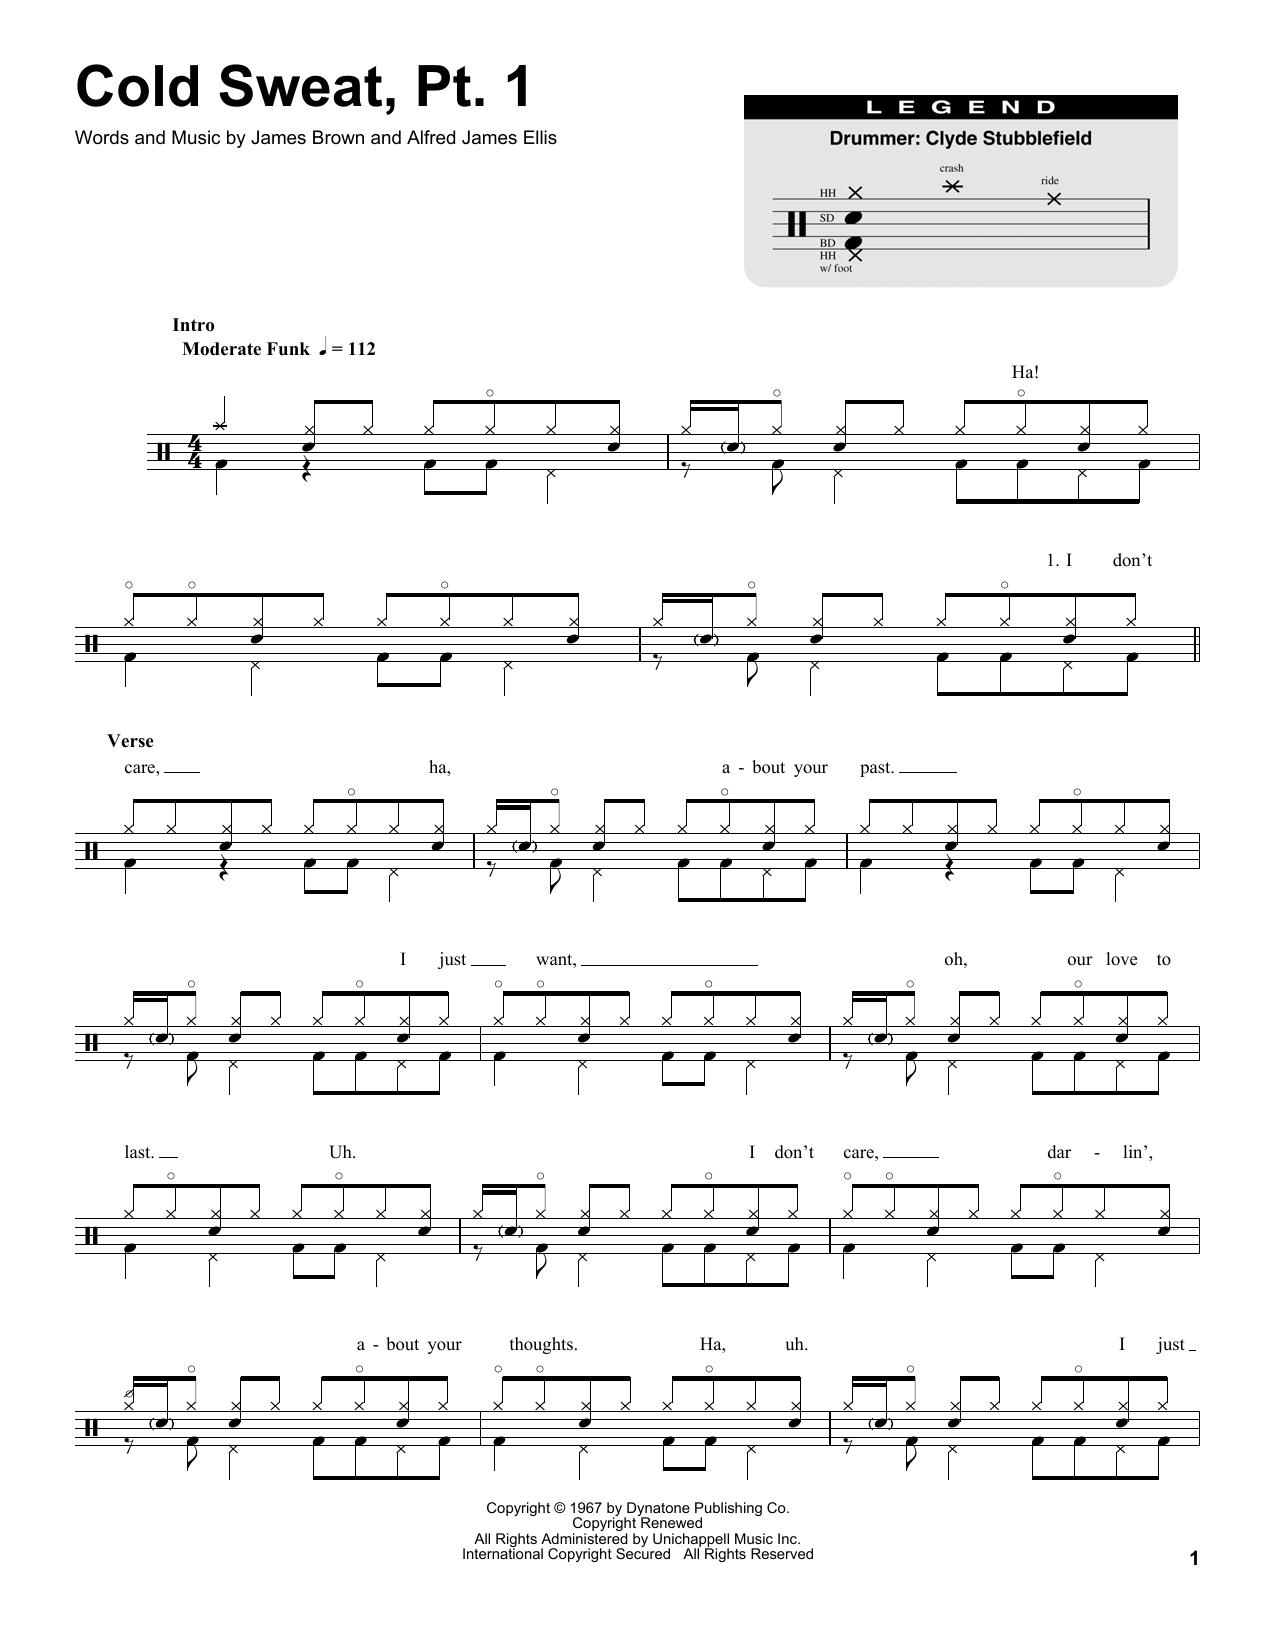 James Brown 'Cold Sweat, Pt  1' Sheet Music Notes, Chords | Download  Printable Drums Transcription - SKU: 174656